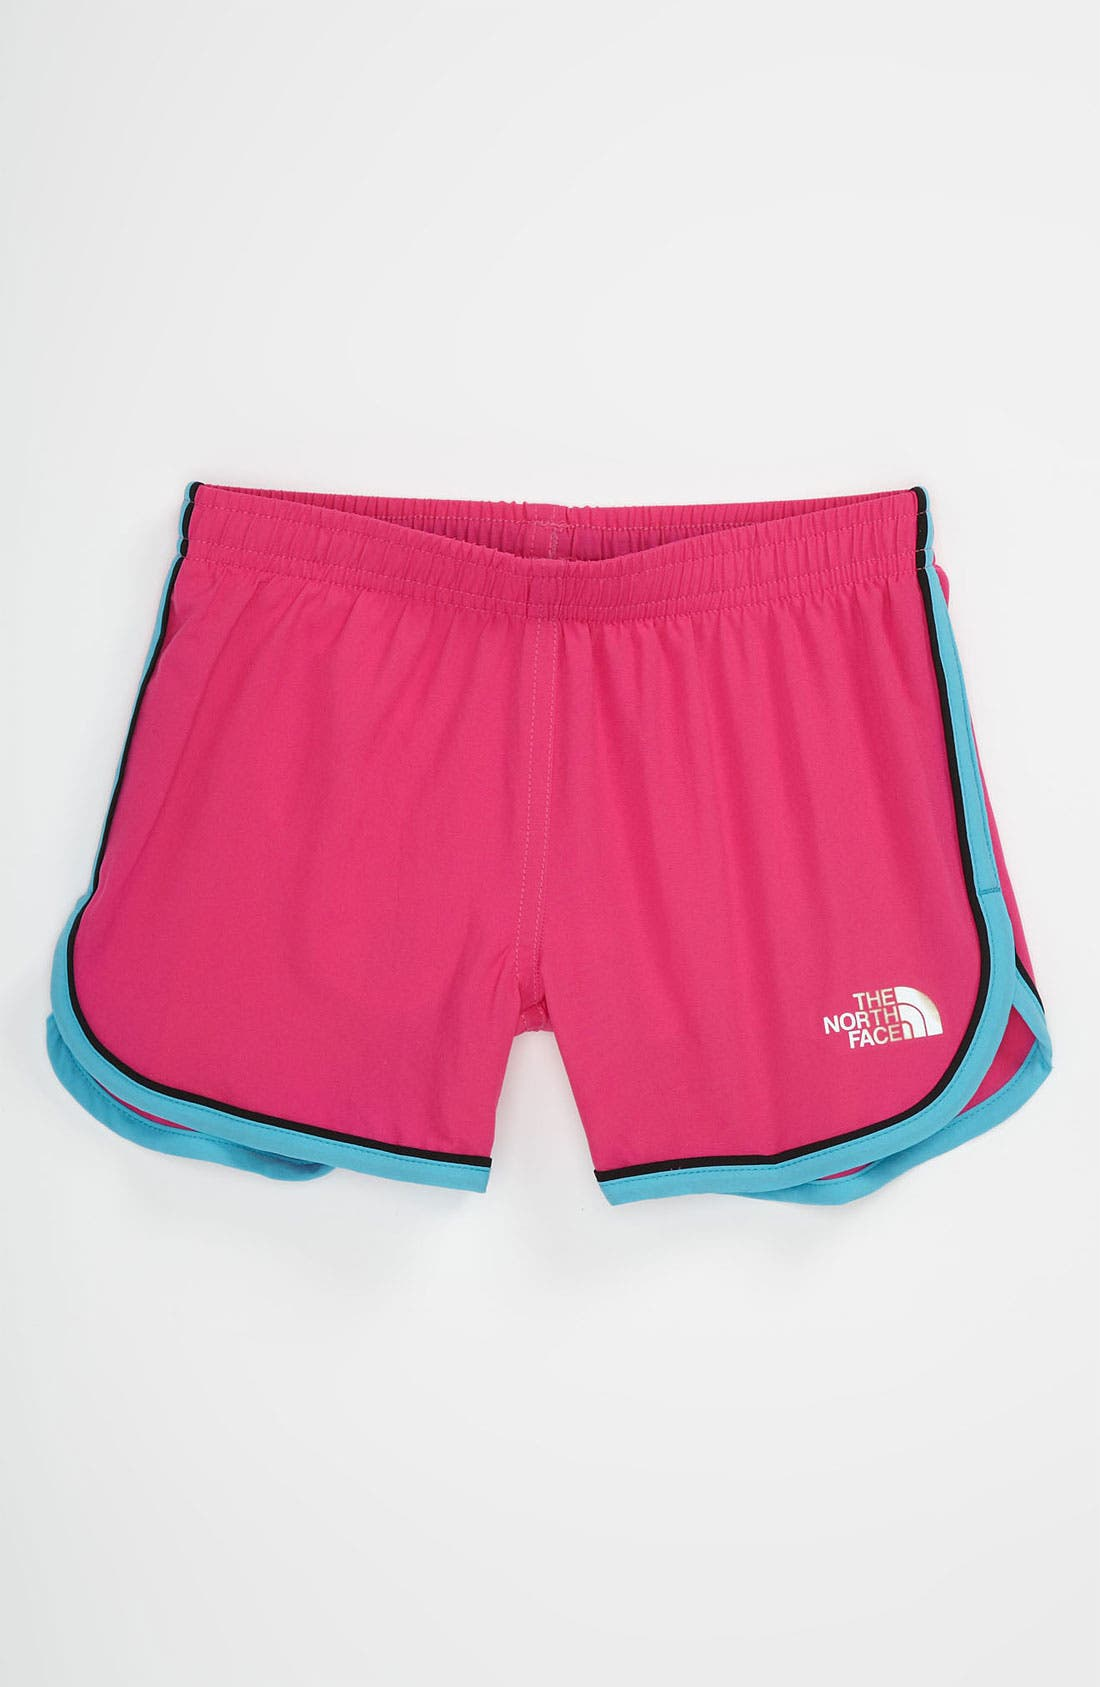 Main Image - The North Face 'Velocitee' Shorts (Big Girls)